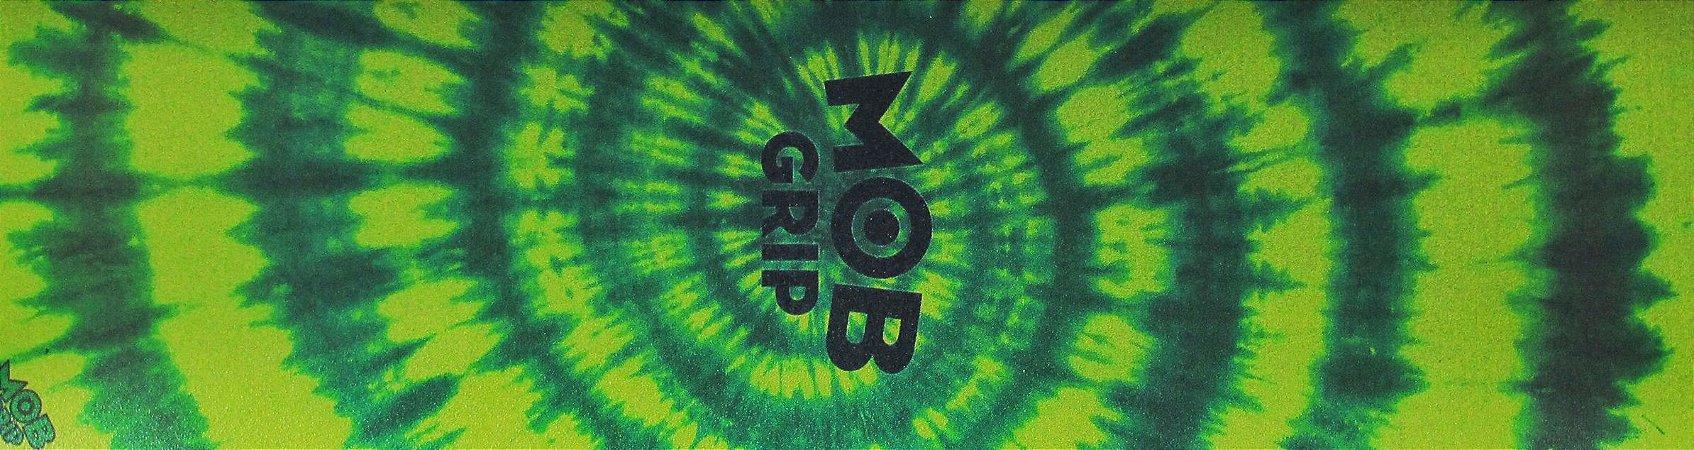 Lixa Mob Grip Tie Dye